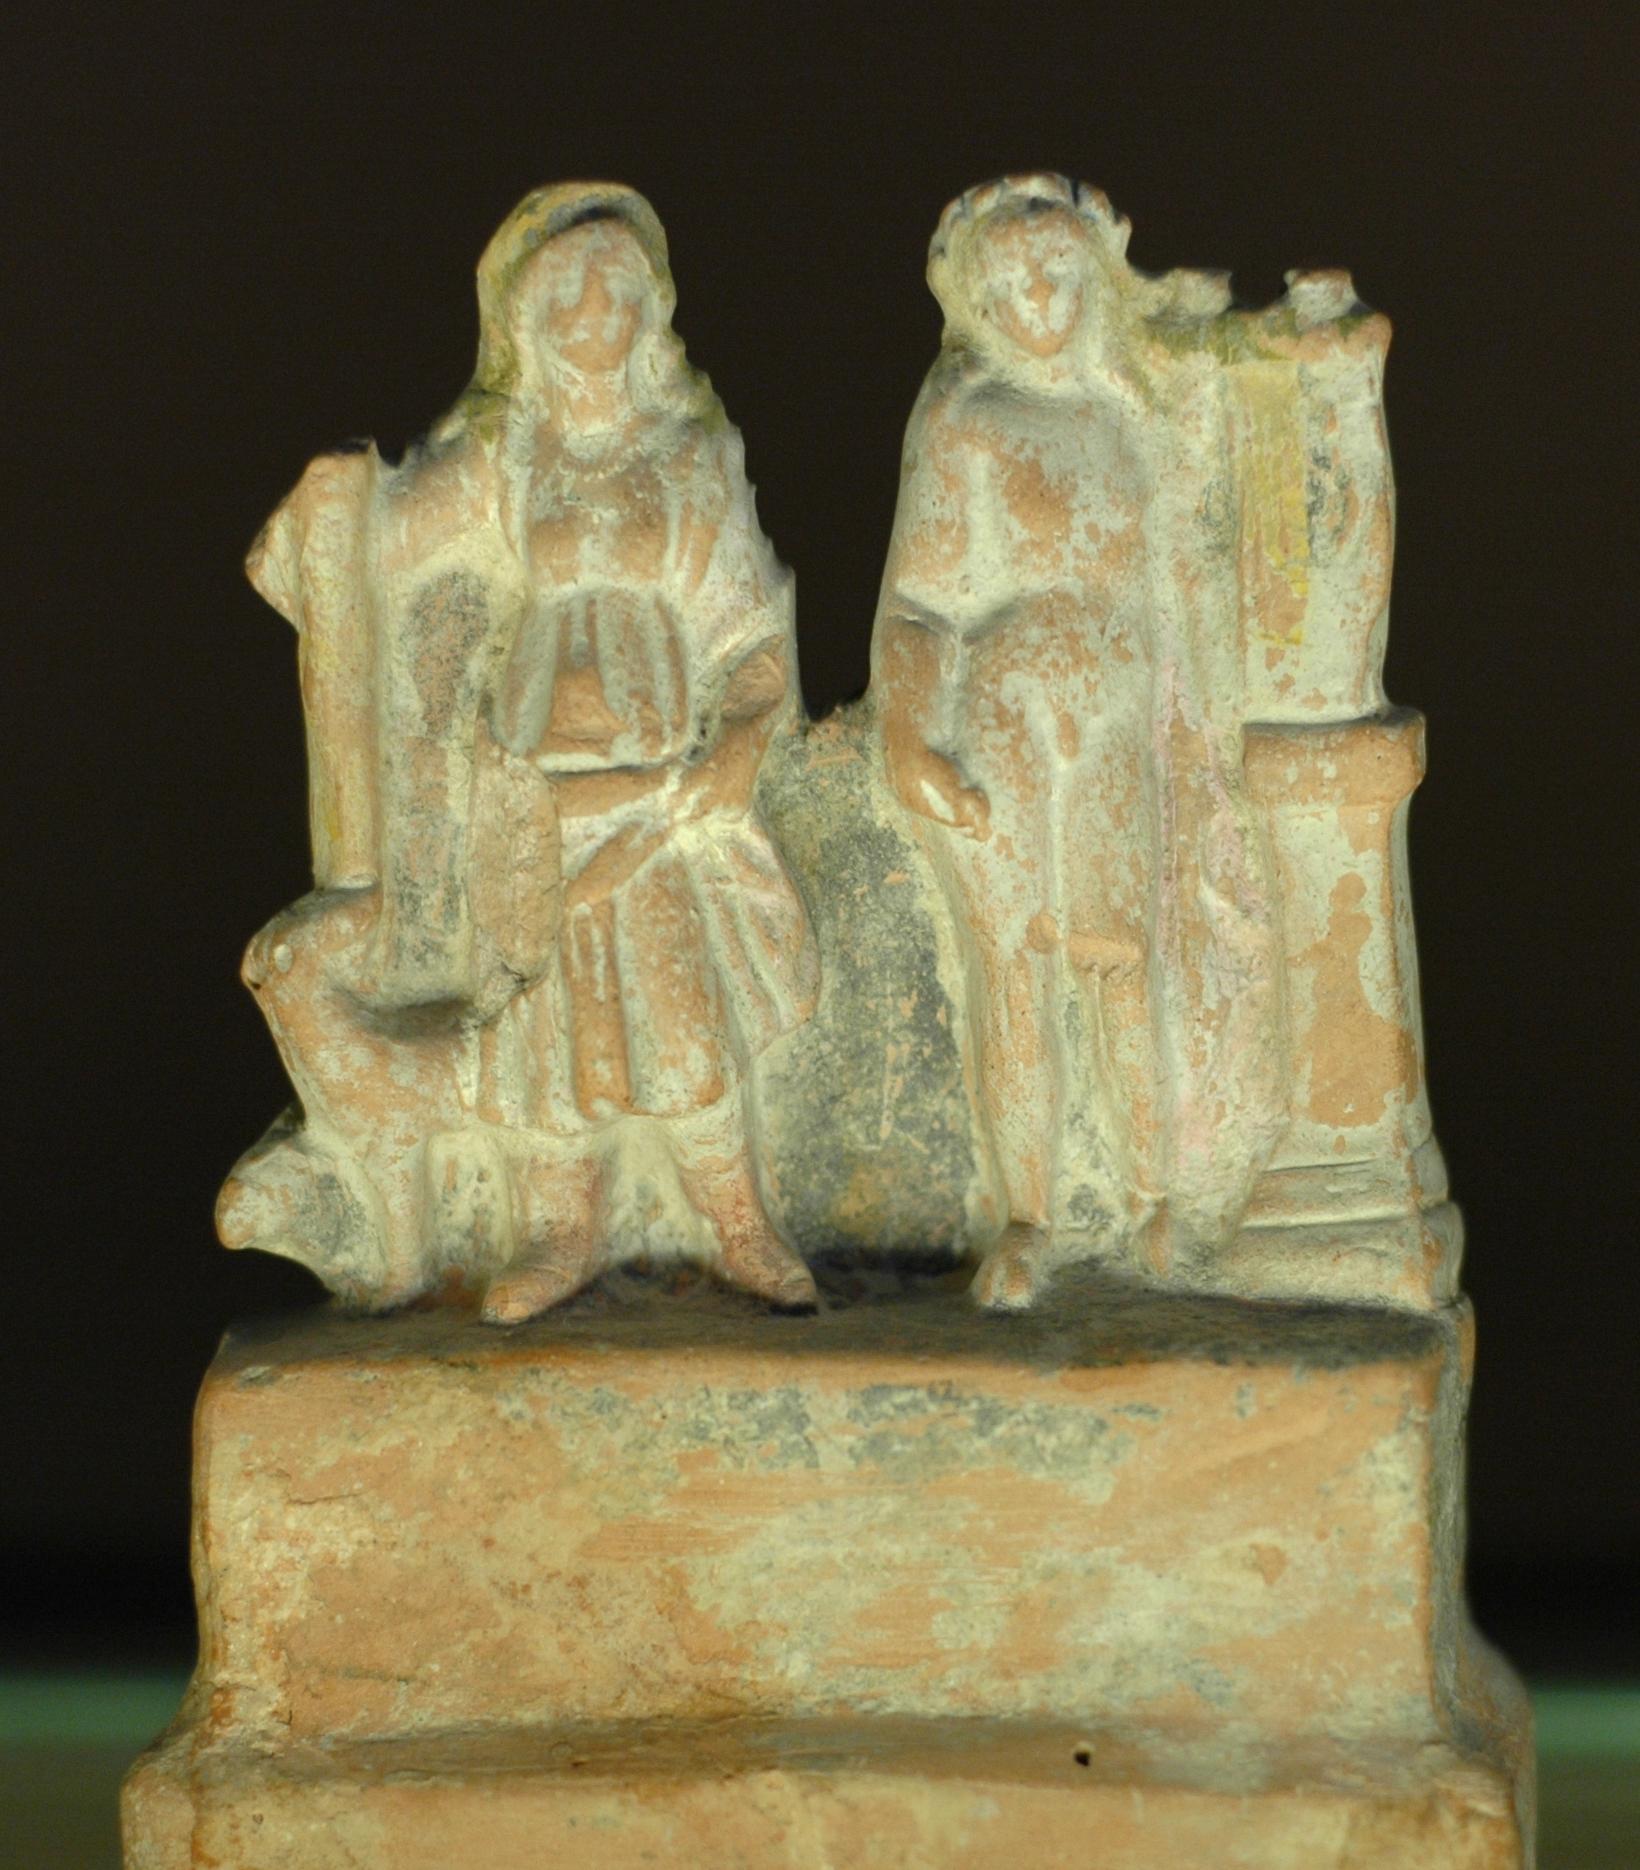 https://upload.wikimedia.org/wikipedia/commons/b/b1/Artemis_Apollo_Louvre_Myr199.jpg